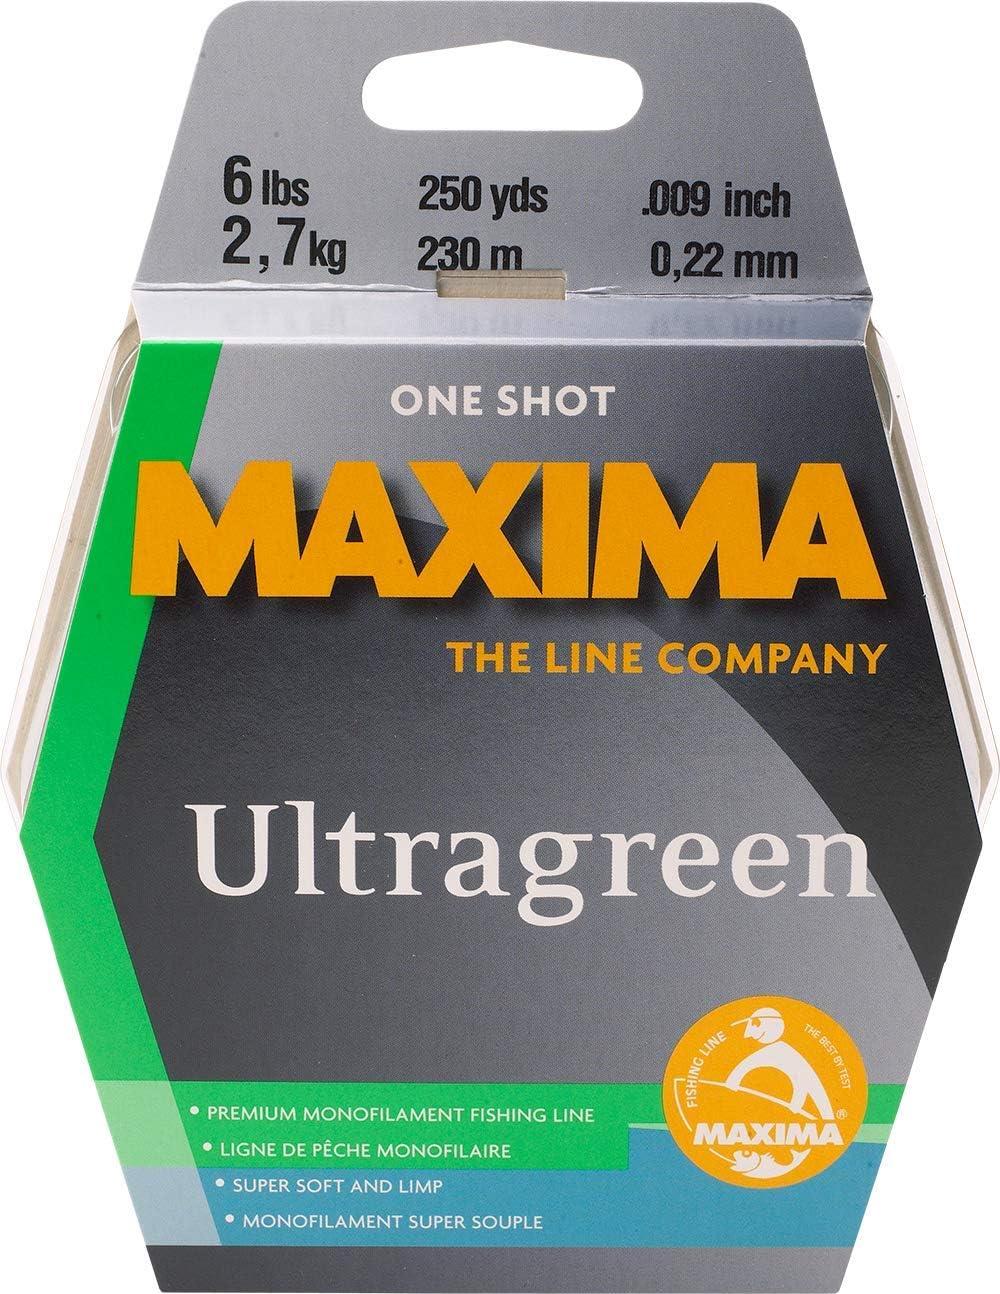 Maxima Fishing Line One Shot Bobine NOUVEAU 6-Pound//250-Yard Moss 6 ULTRAGREEN